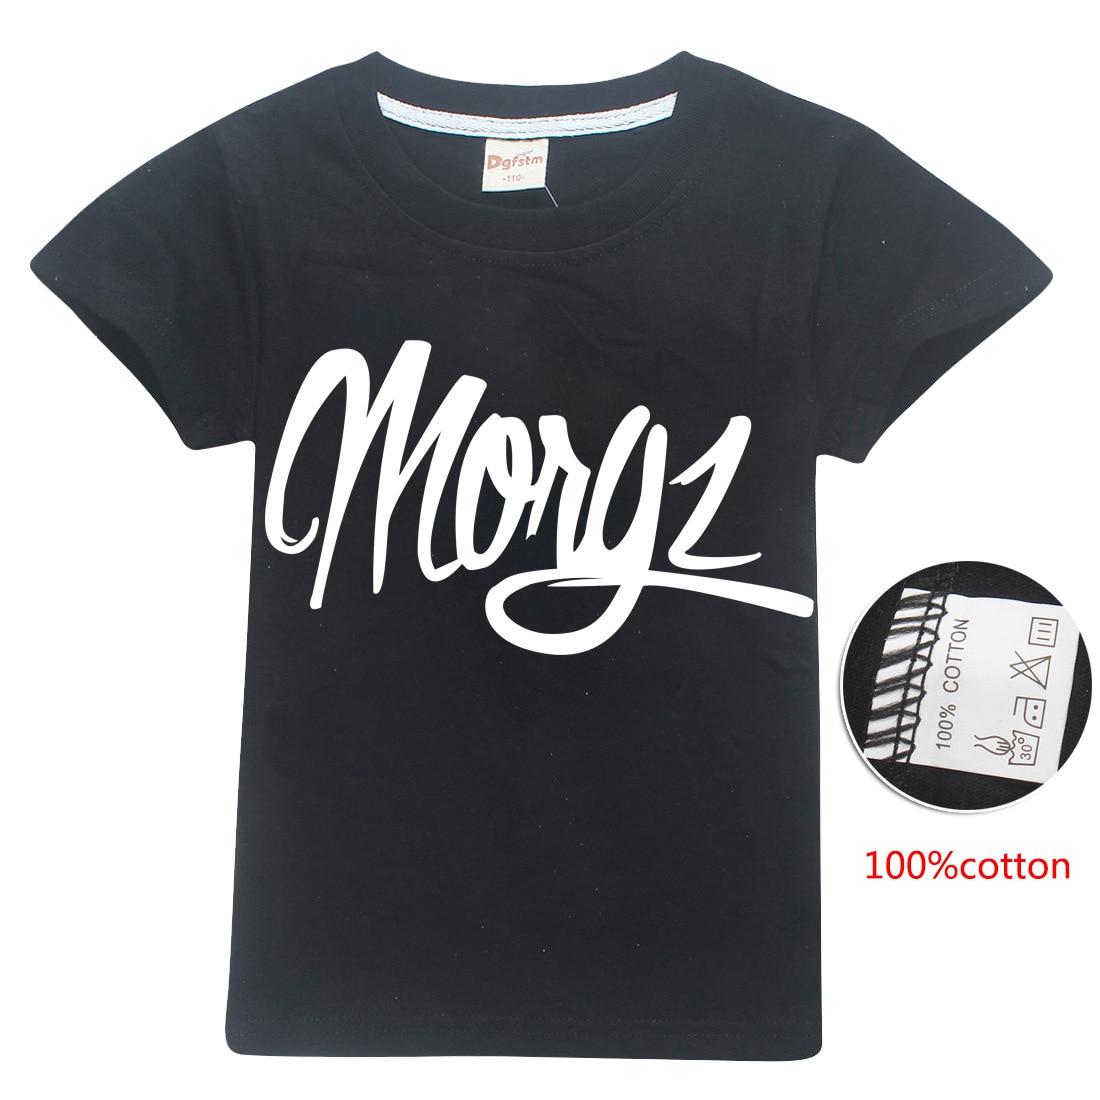 US $7 63 8% OFF|Unspeakable T Shirt Marshmello Kids T Shirt Dj Music  Marshmello Sweatshirt Baby Boys Girls Tops Modis Tee Ryan Toys Review  2019-in